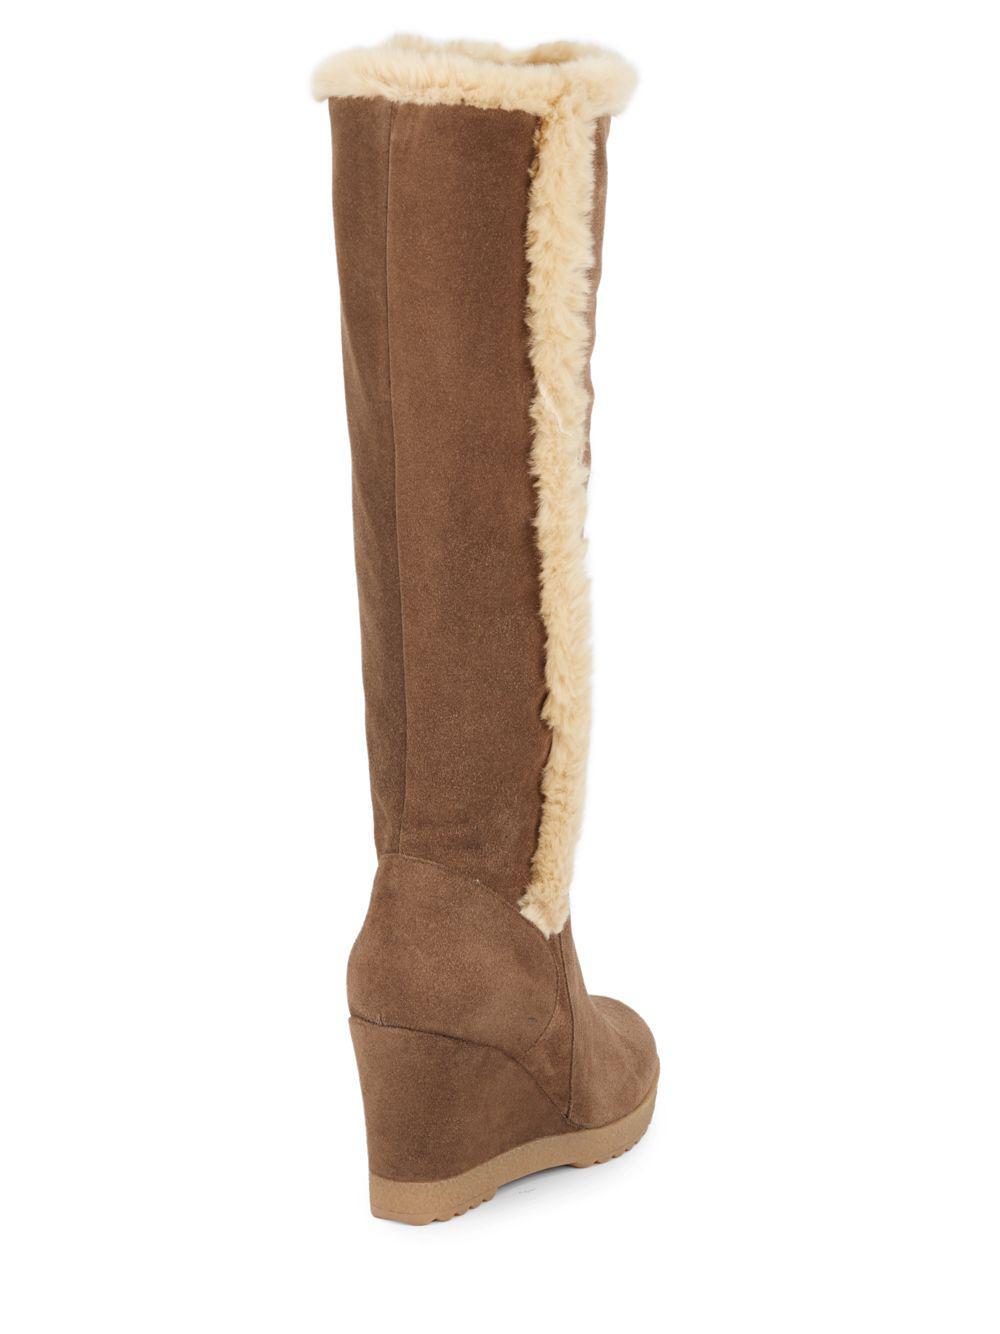 a9d0d80f3da Lyst - Aquatalia Curran Faux Fur-trimmed Suede Tall Wedge Boots in Brown